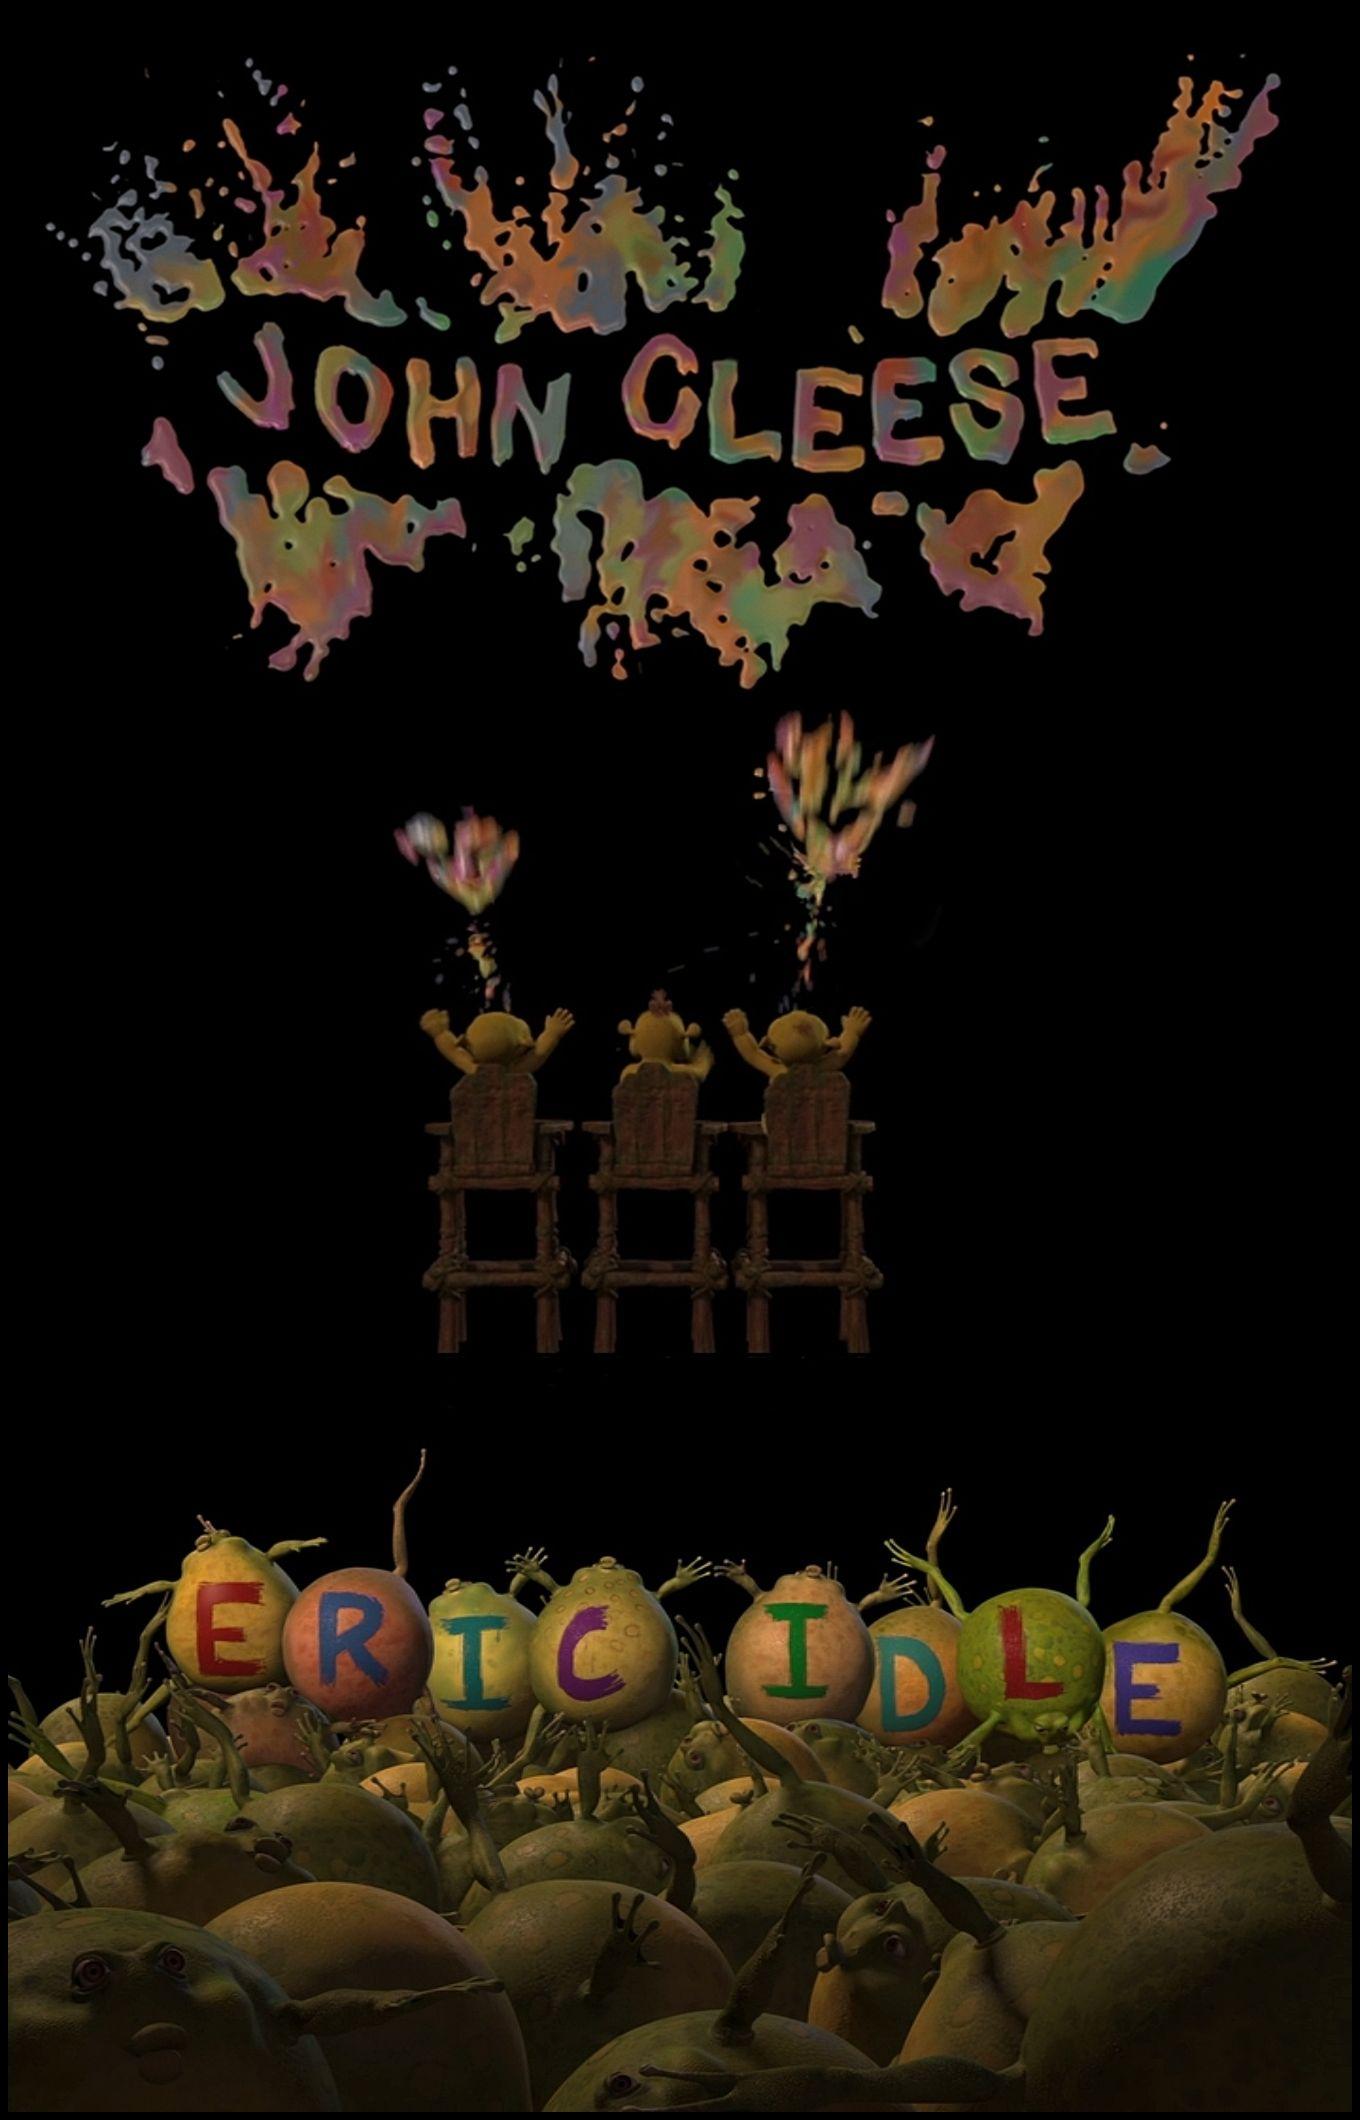 Pythons on Shrek the third John Cleese & Eric Idle